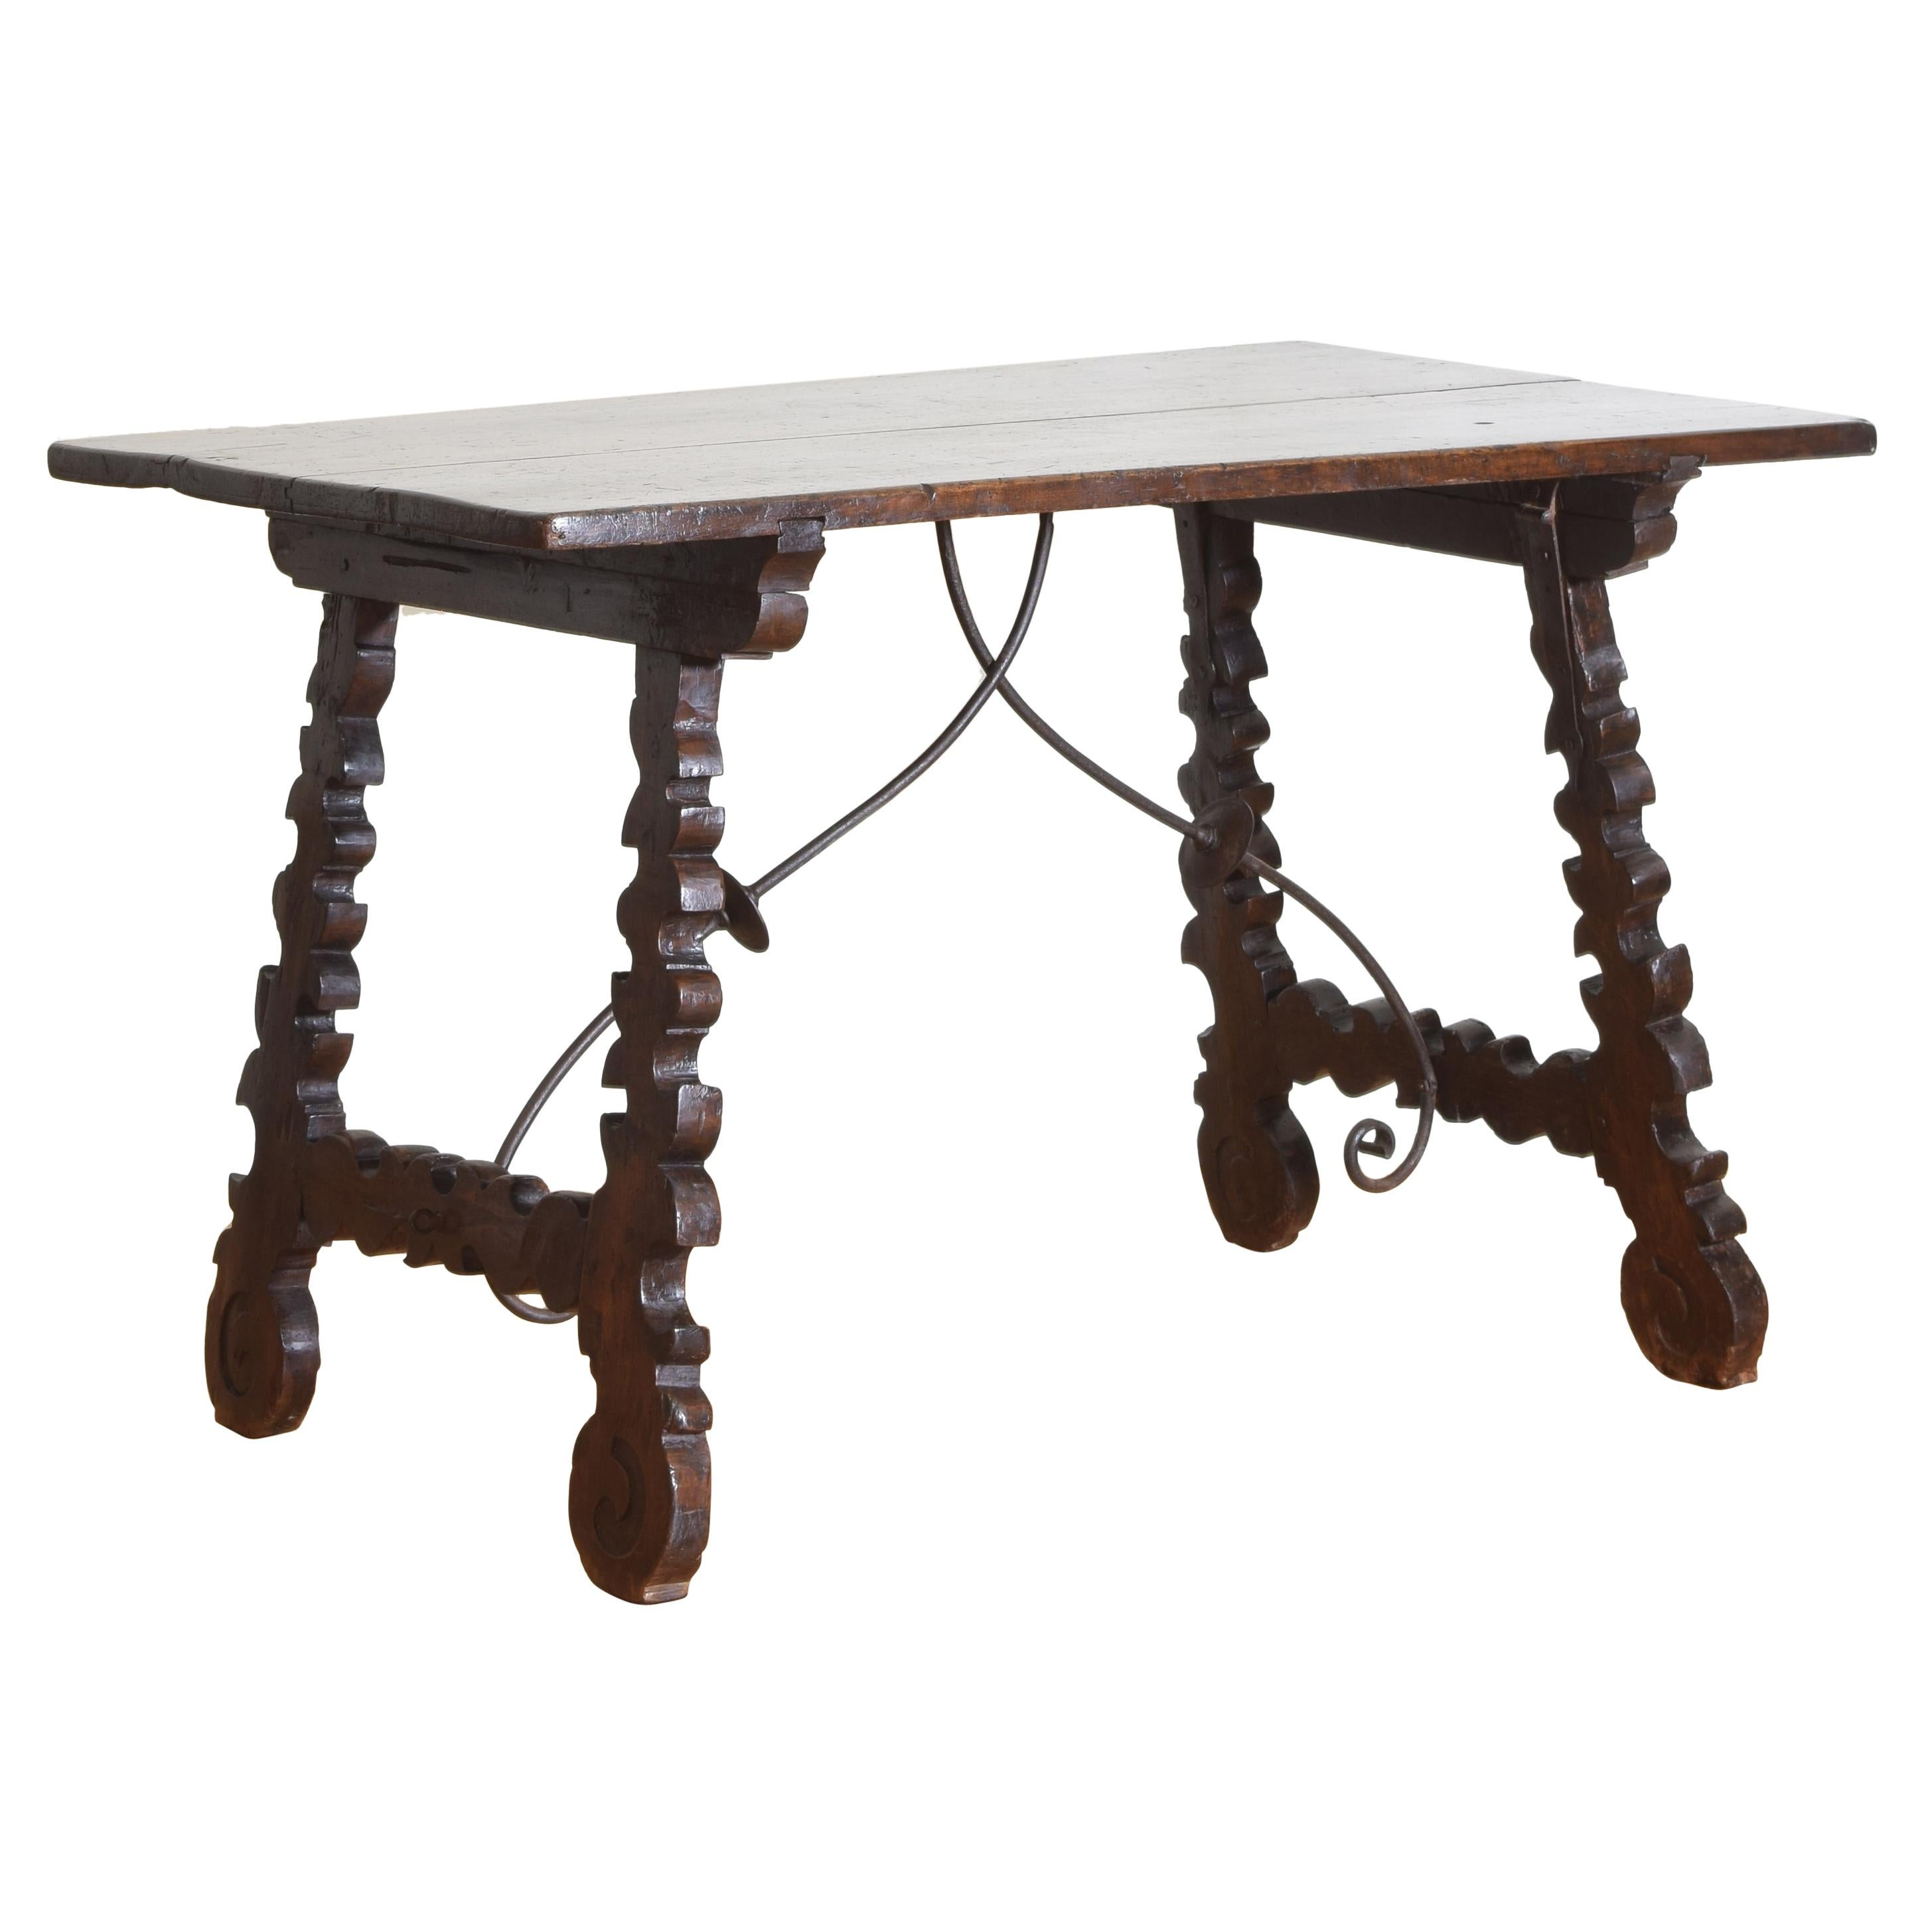 Spanish Late Baroque Walnut & Iron Mounted Guard Room Table